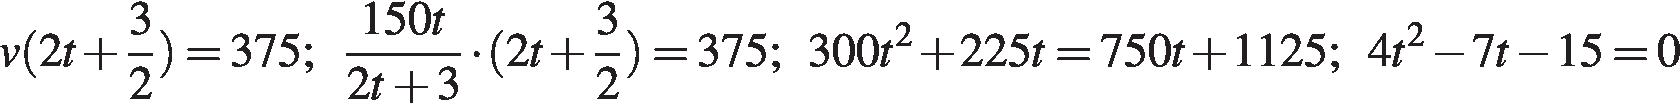 http://sdamgia.ru/formula/64/641da77e575913ff6a256144ef16e3e0p.png